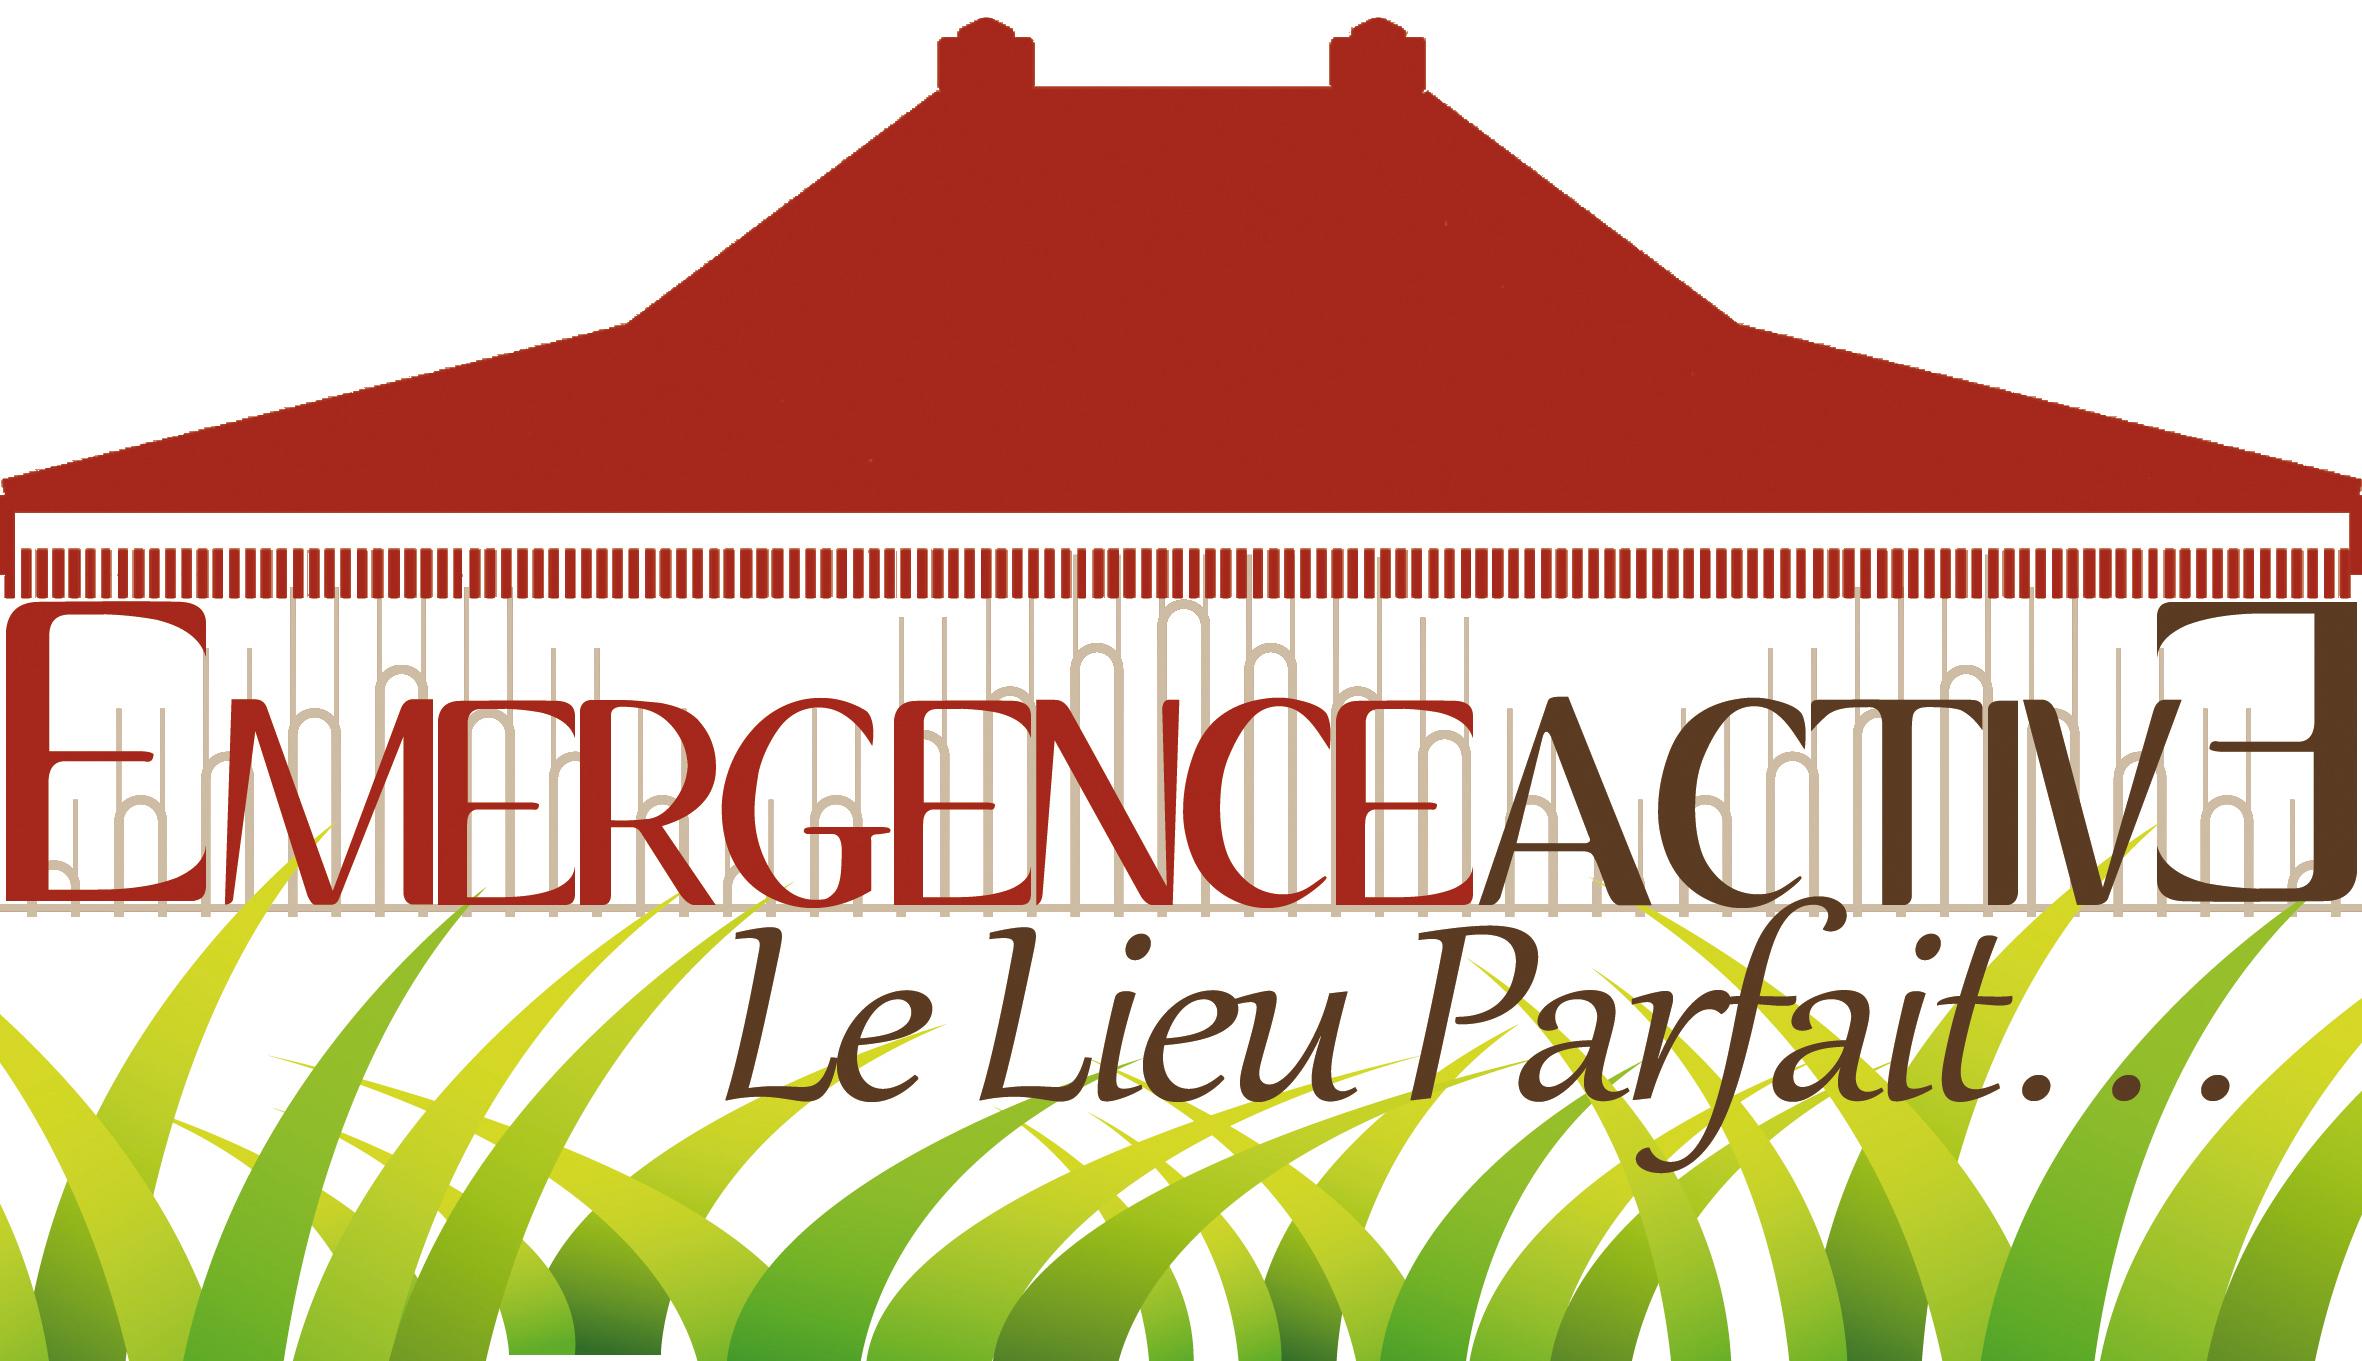 EmergenceActiv3| Création | Logo vectoriel